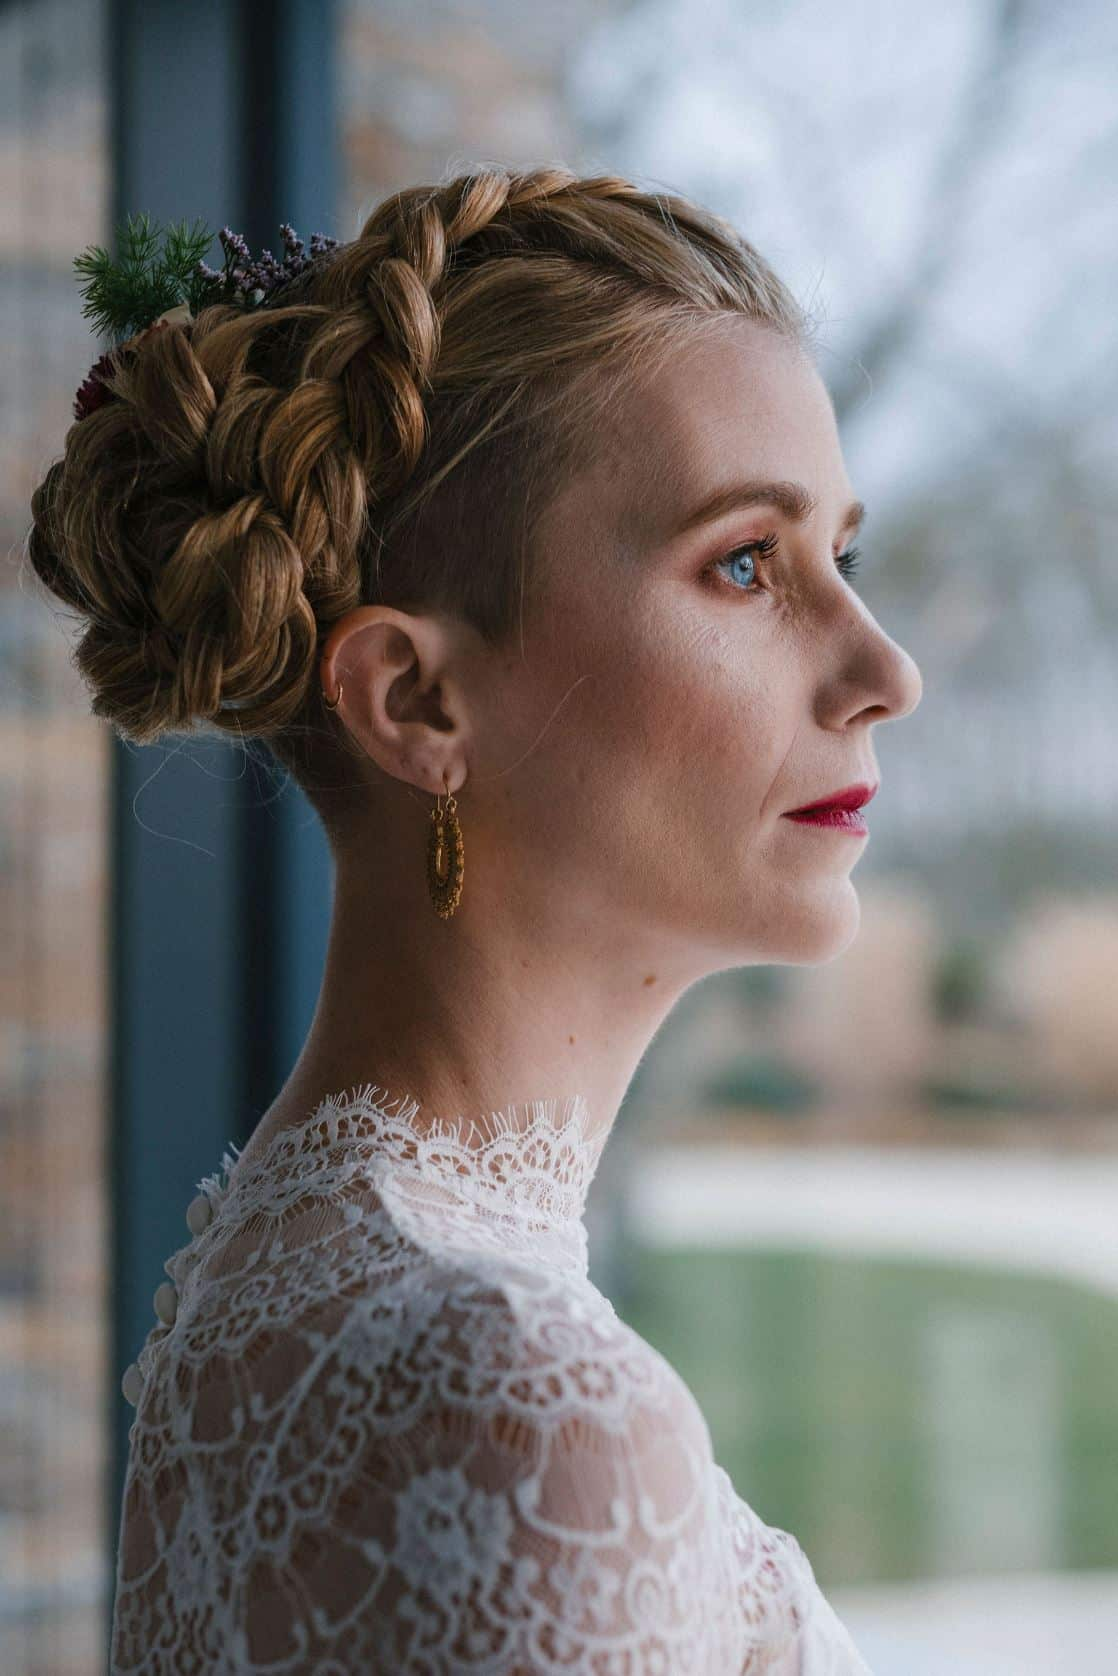 projet-meliwa-makeup-artist-mariage